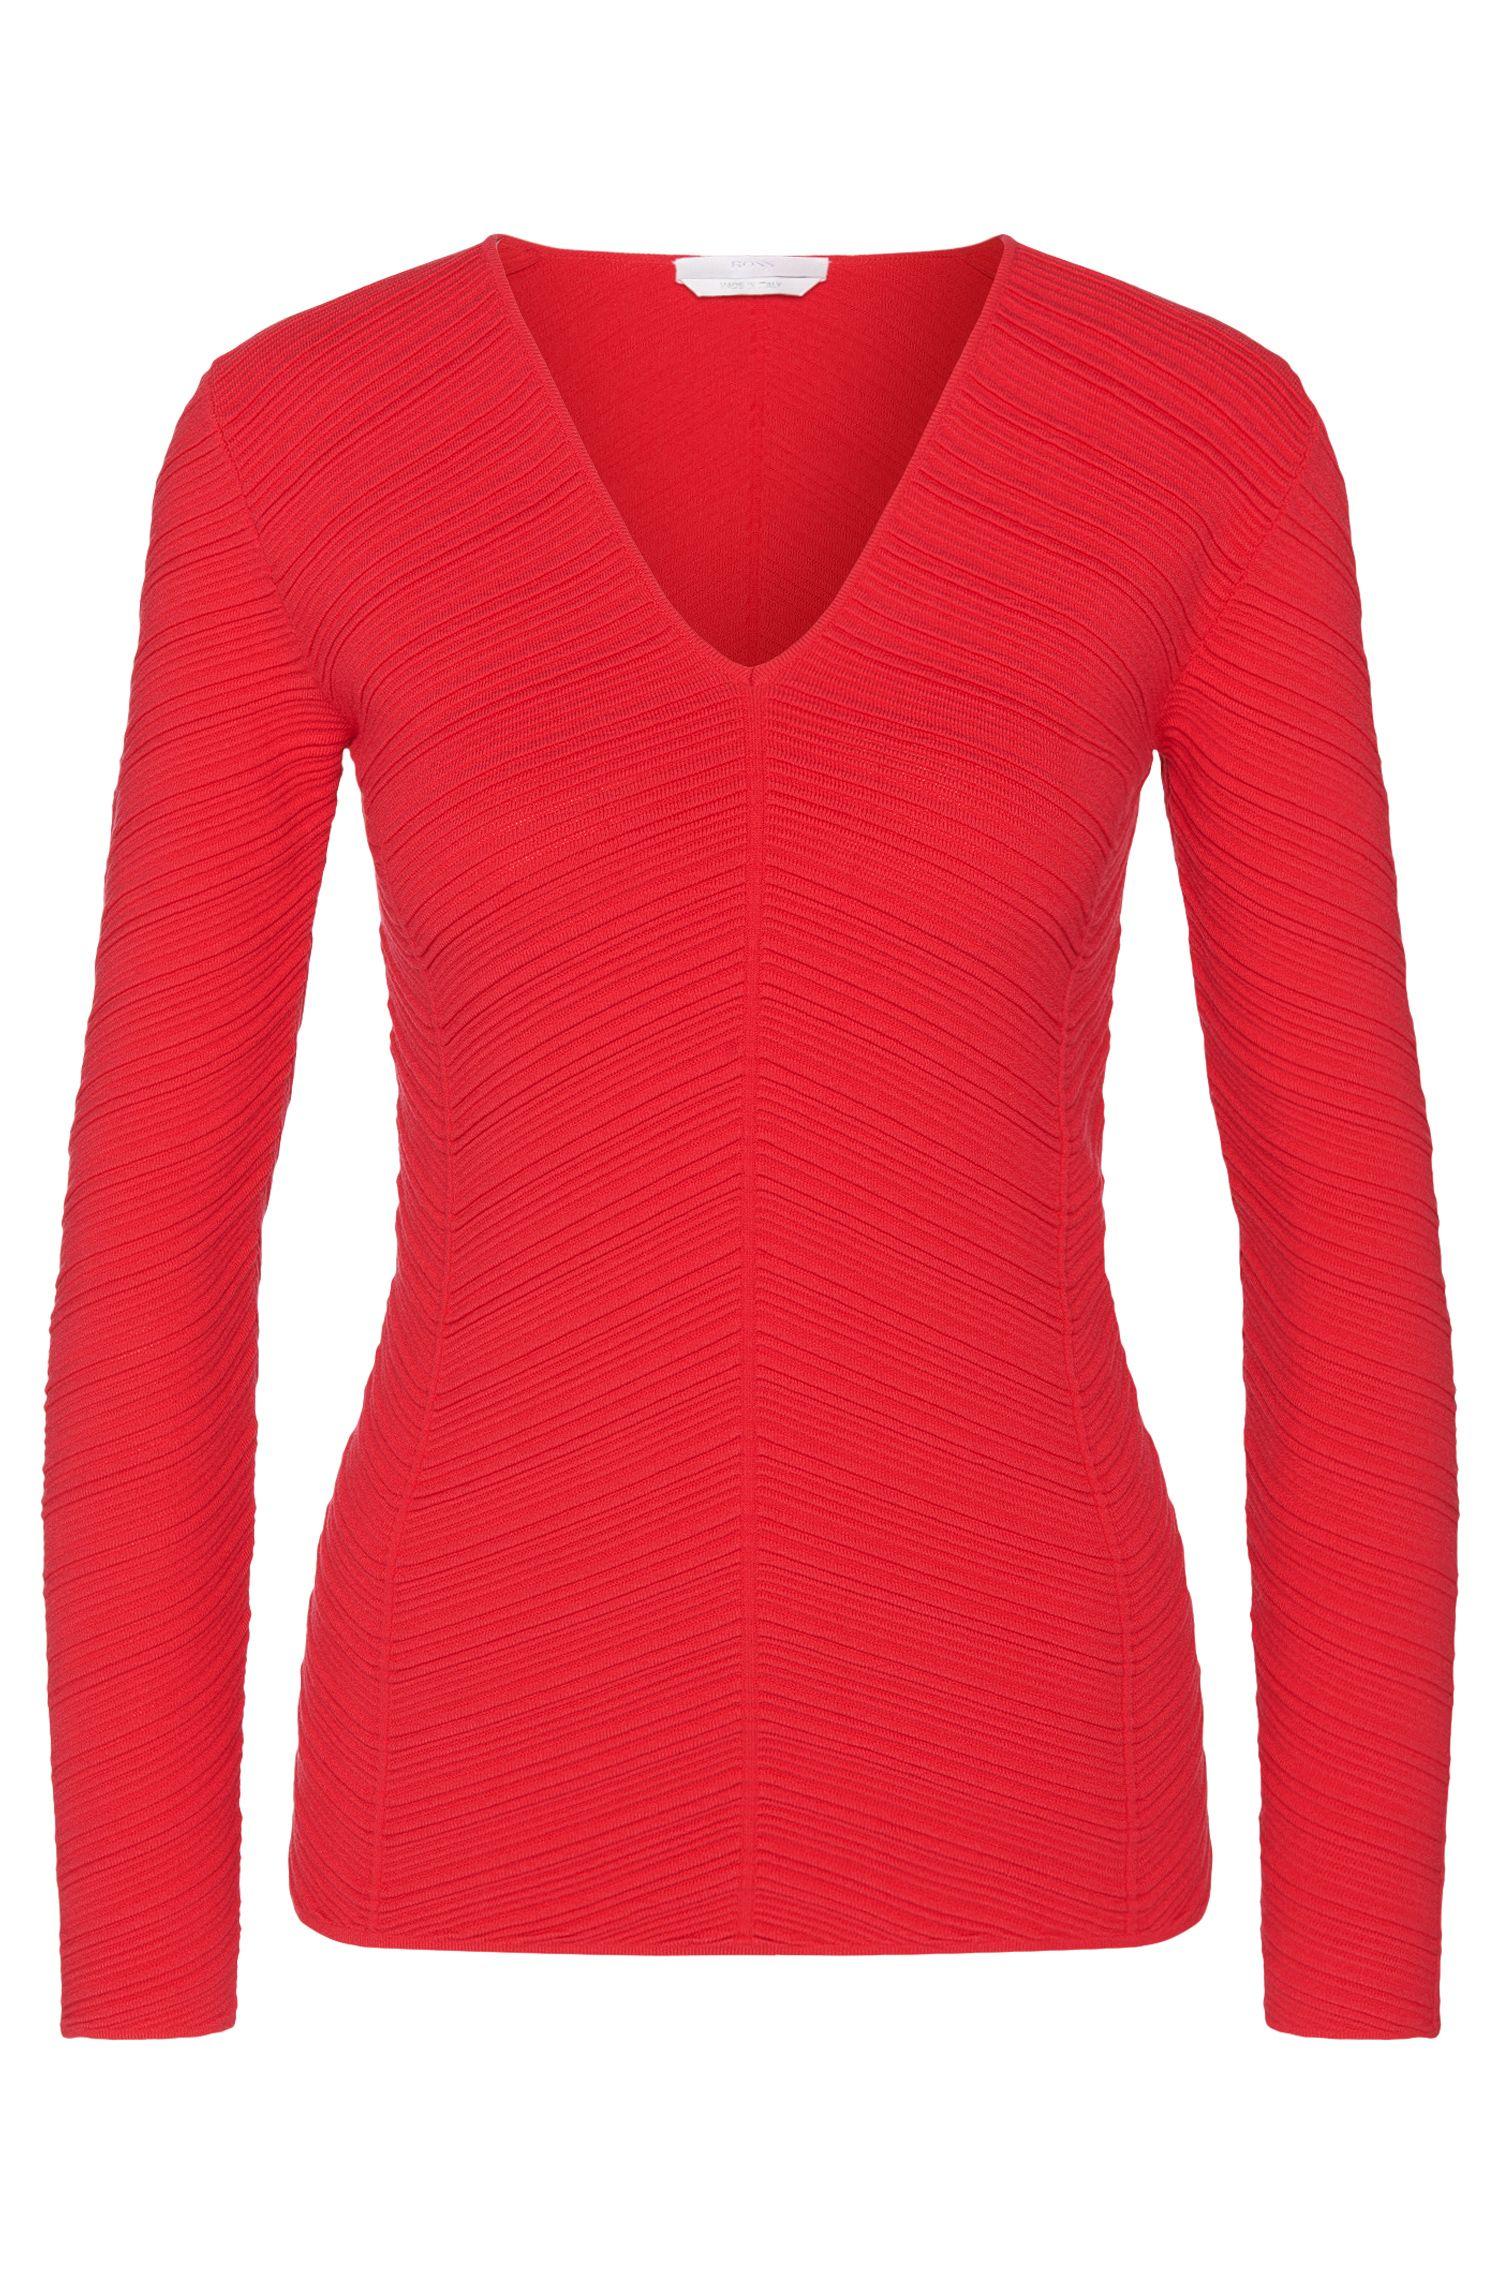 Ottoman V-Neck Sweater | Faizah, Dark pink